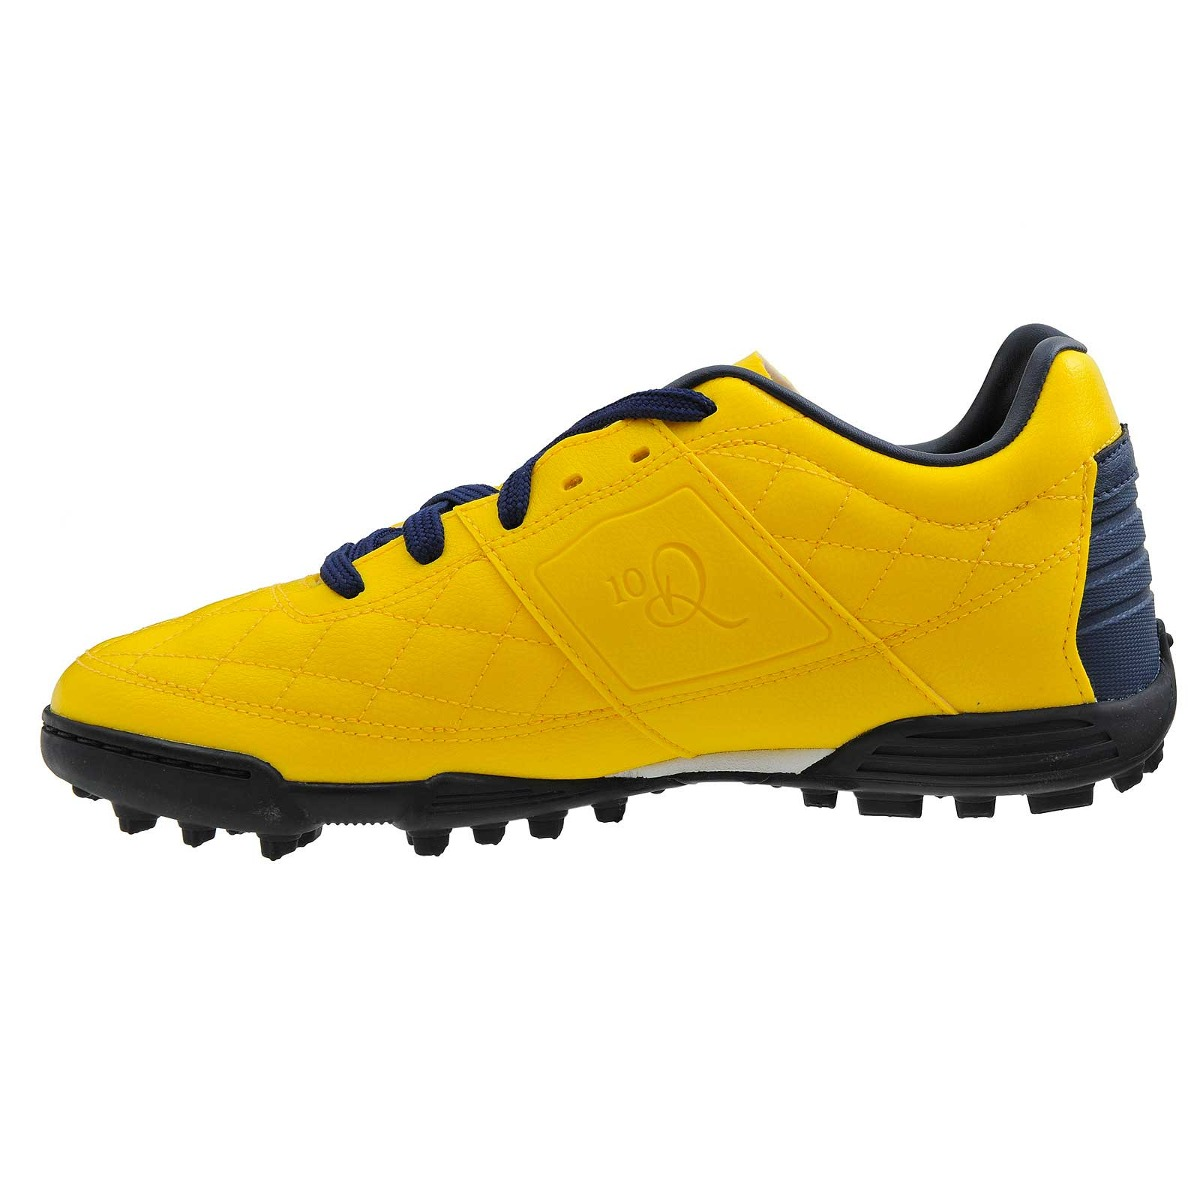 Netshoes- Chuteira Nike 10R O Cara FG - YouTube, nike r10 o cara